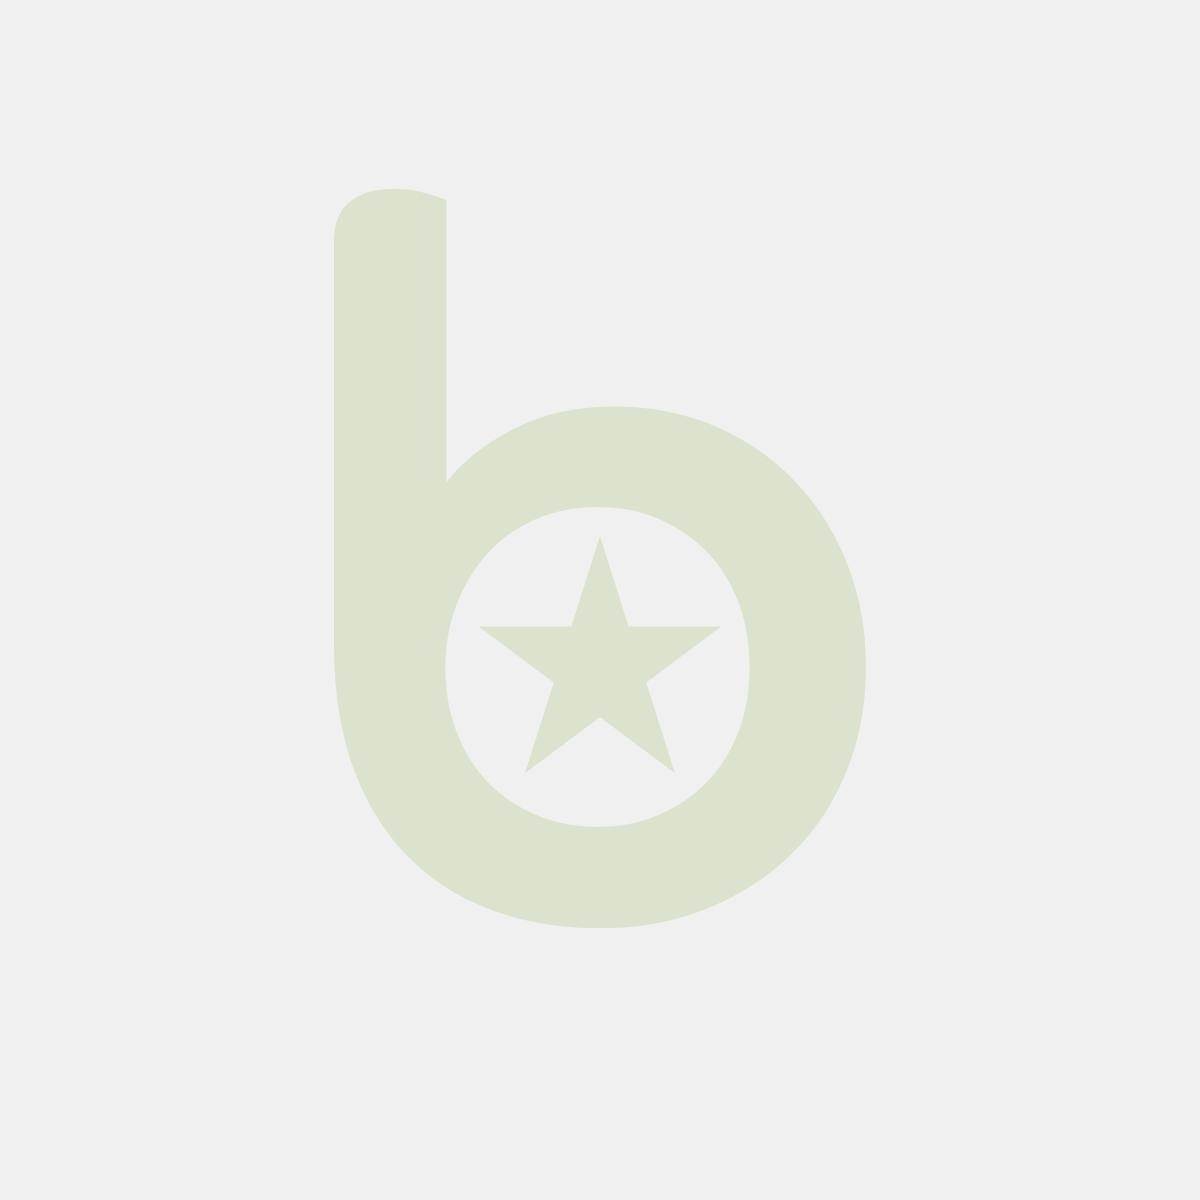 Patyczki 15cm GOLF op. 250szt - FINGERFOOD